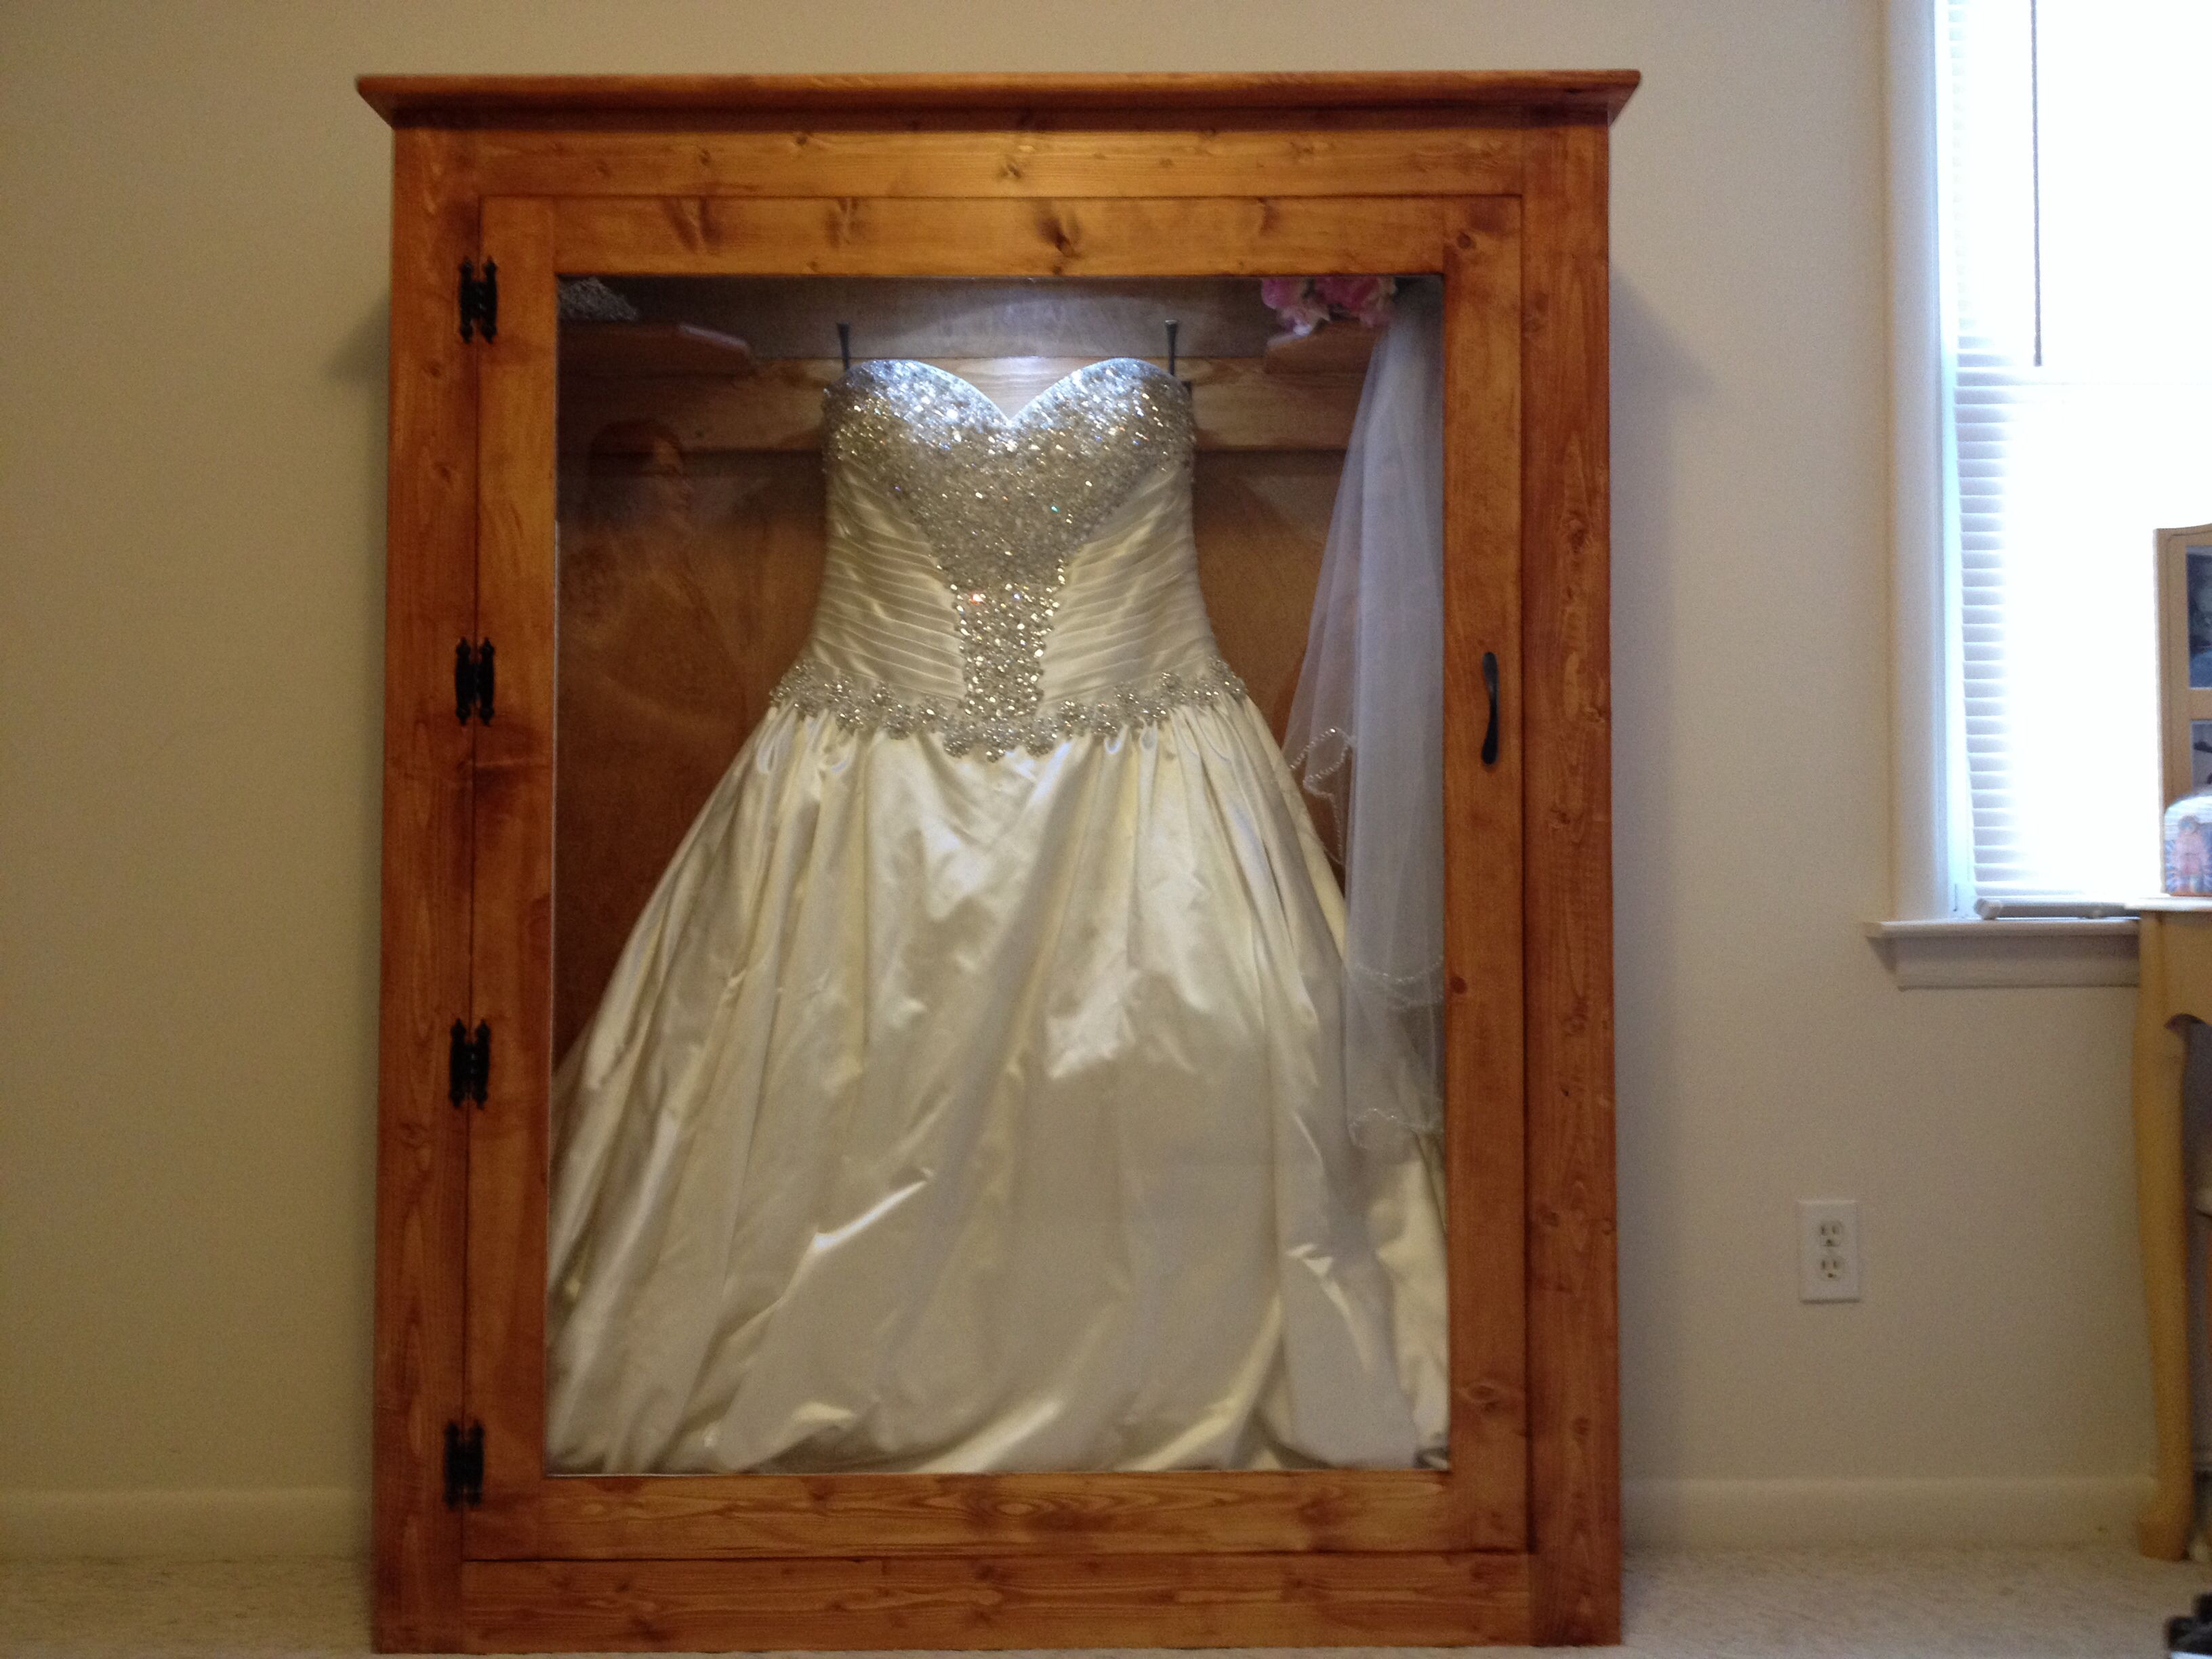 wedding dress shadow box wedding shadow box Best Christmas gift ever my husband made me a shadow box for my wedding dress